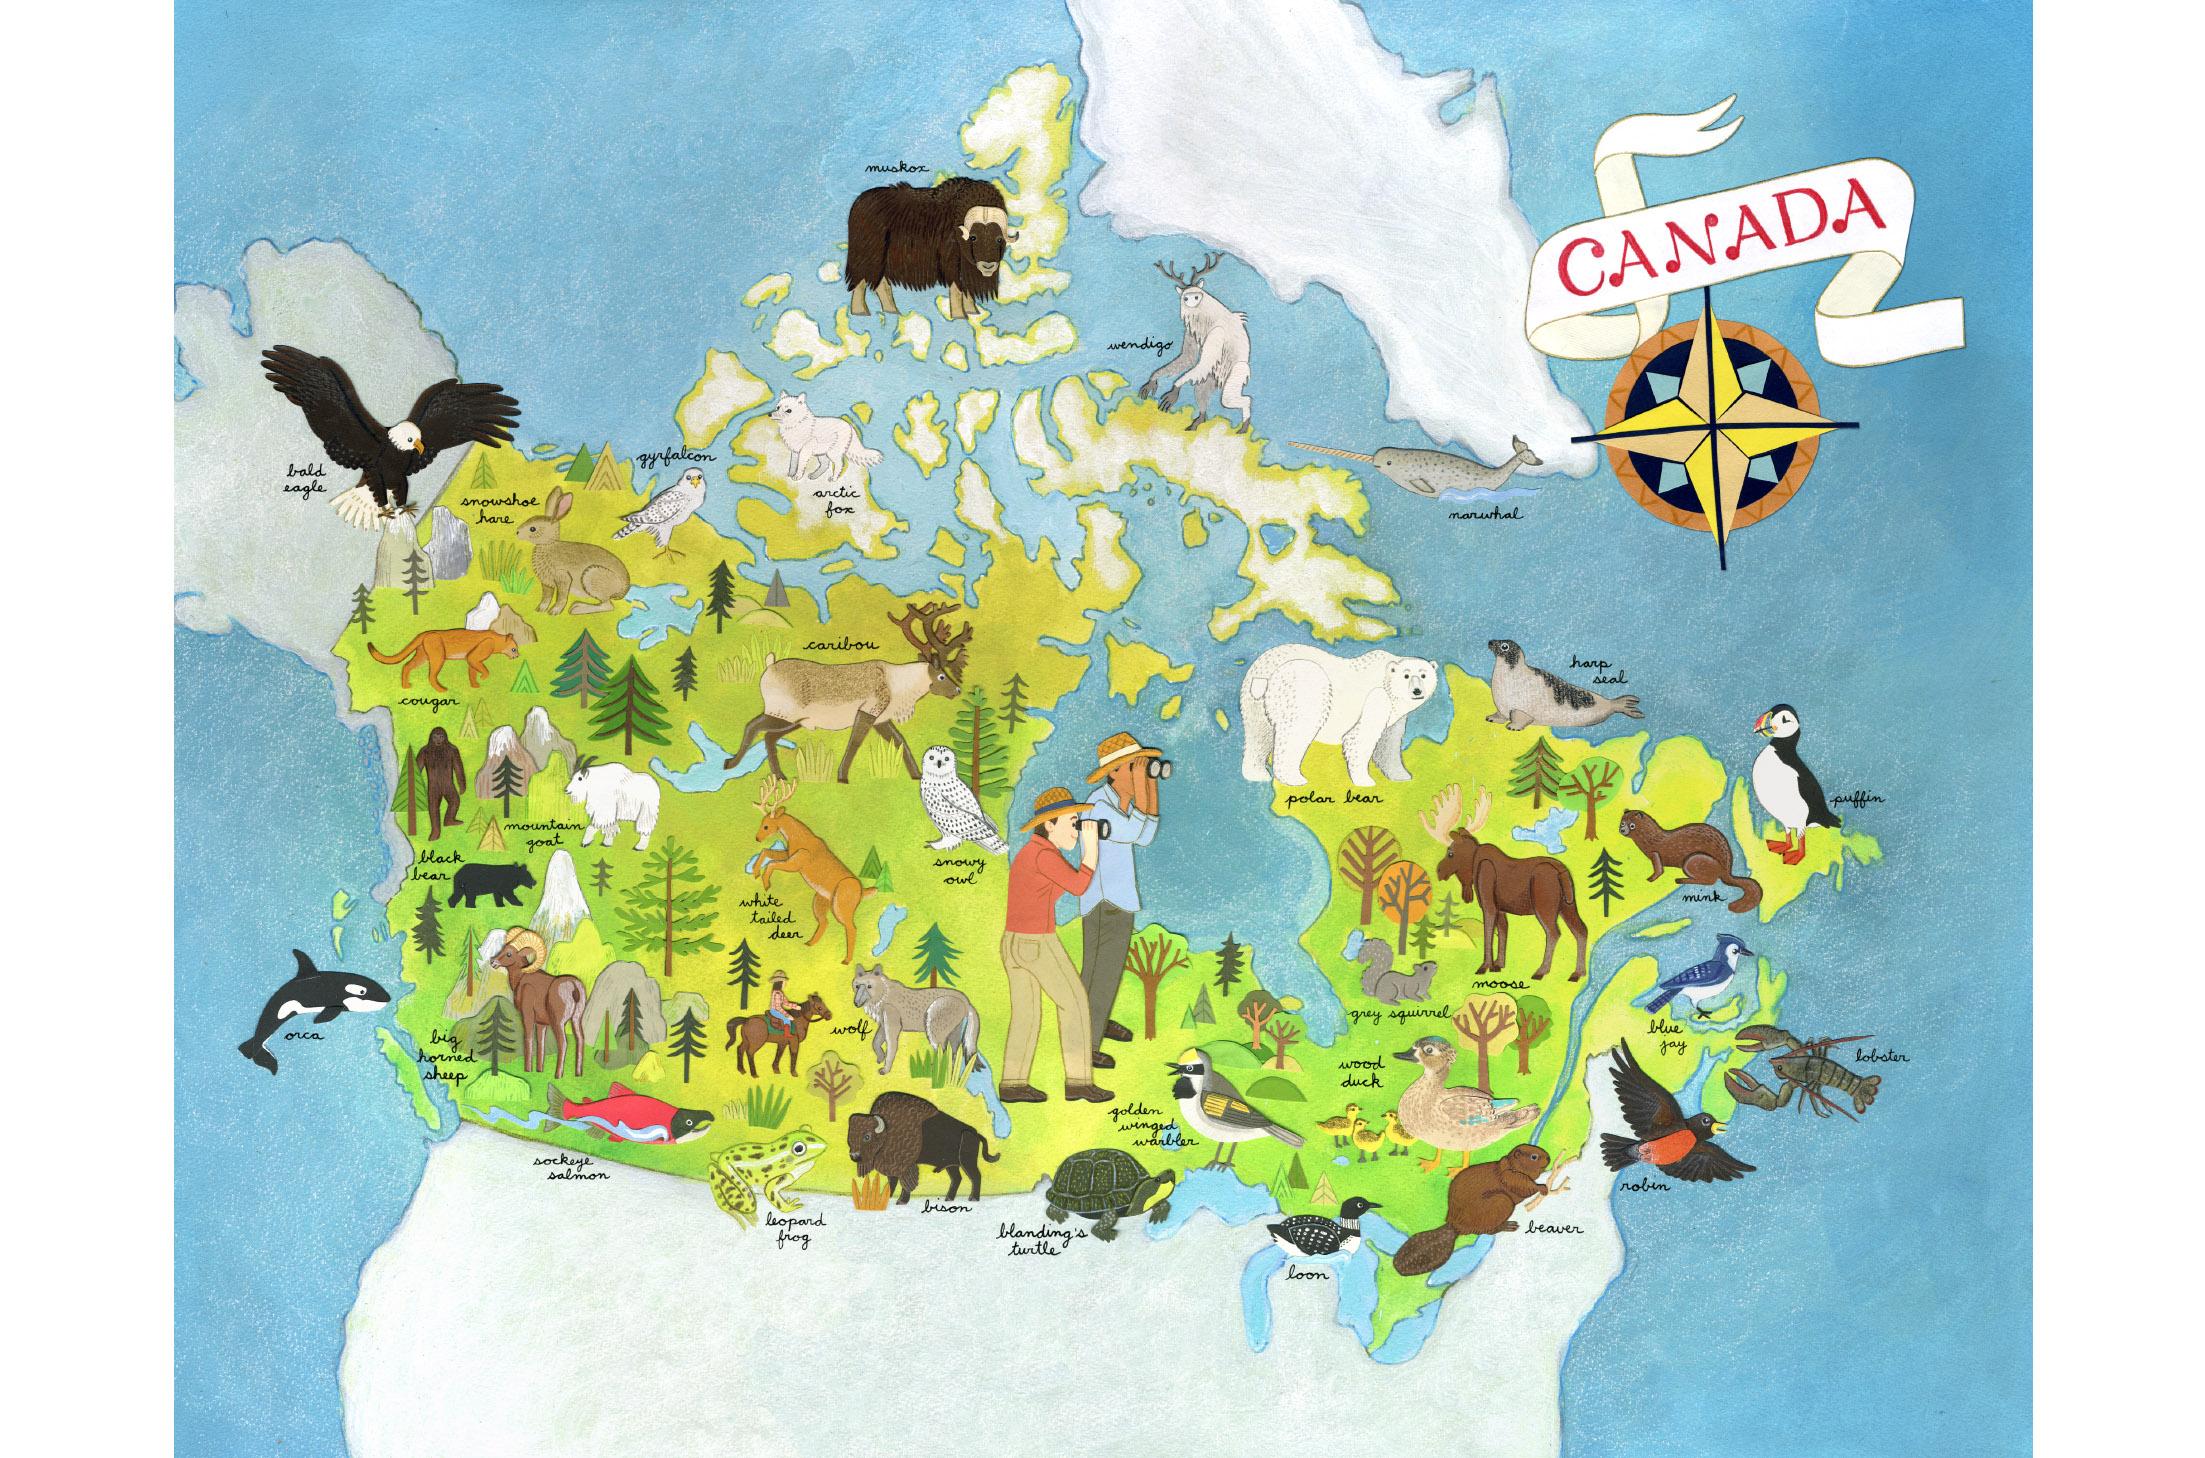 animals_of_canada_map.jpg